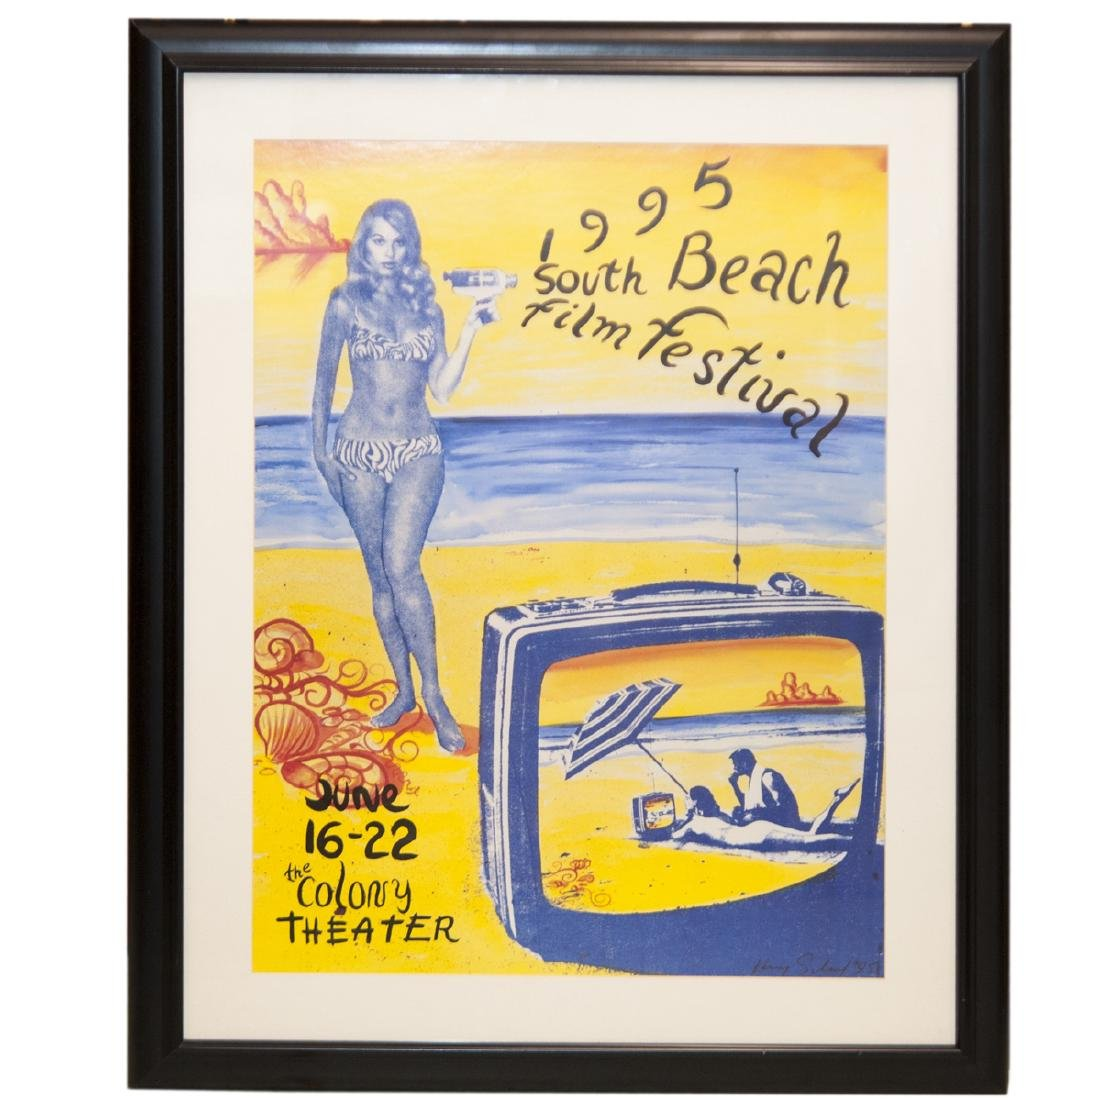 1995 South Beach Film Festival Poster